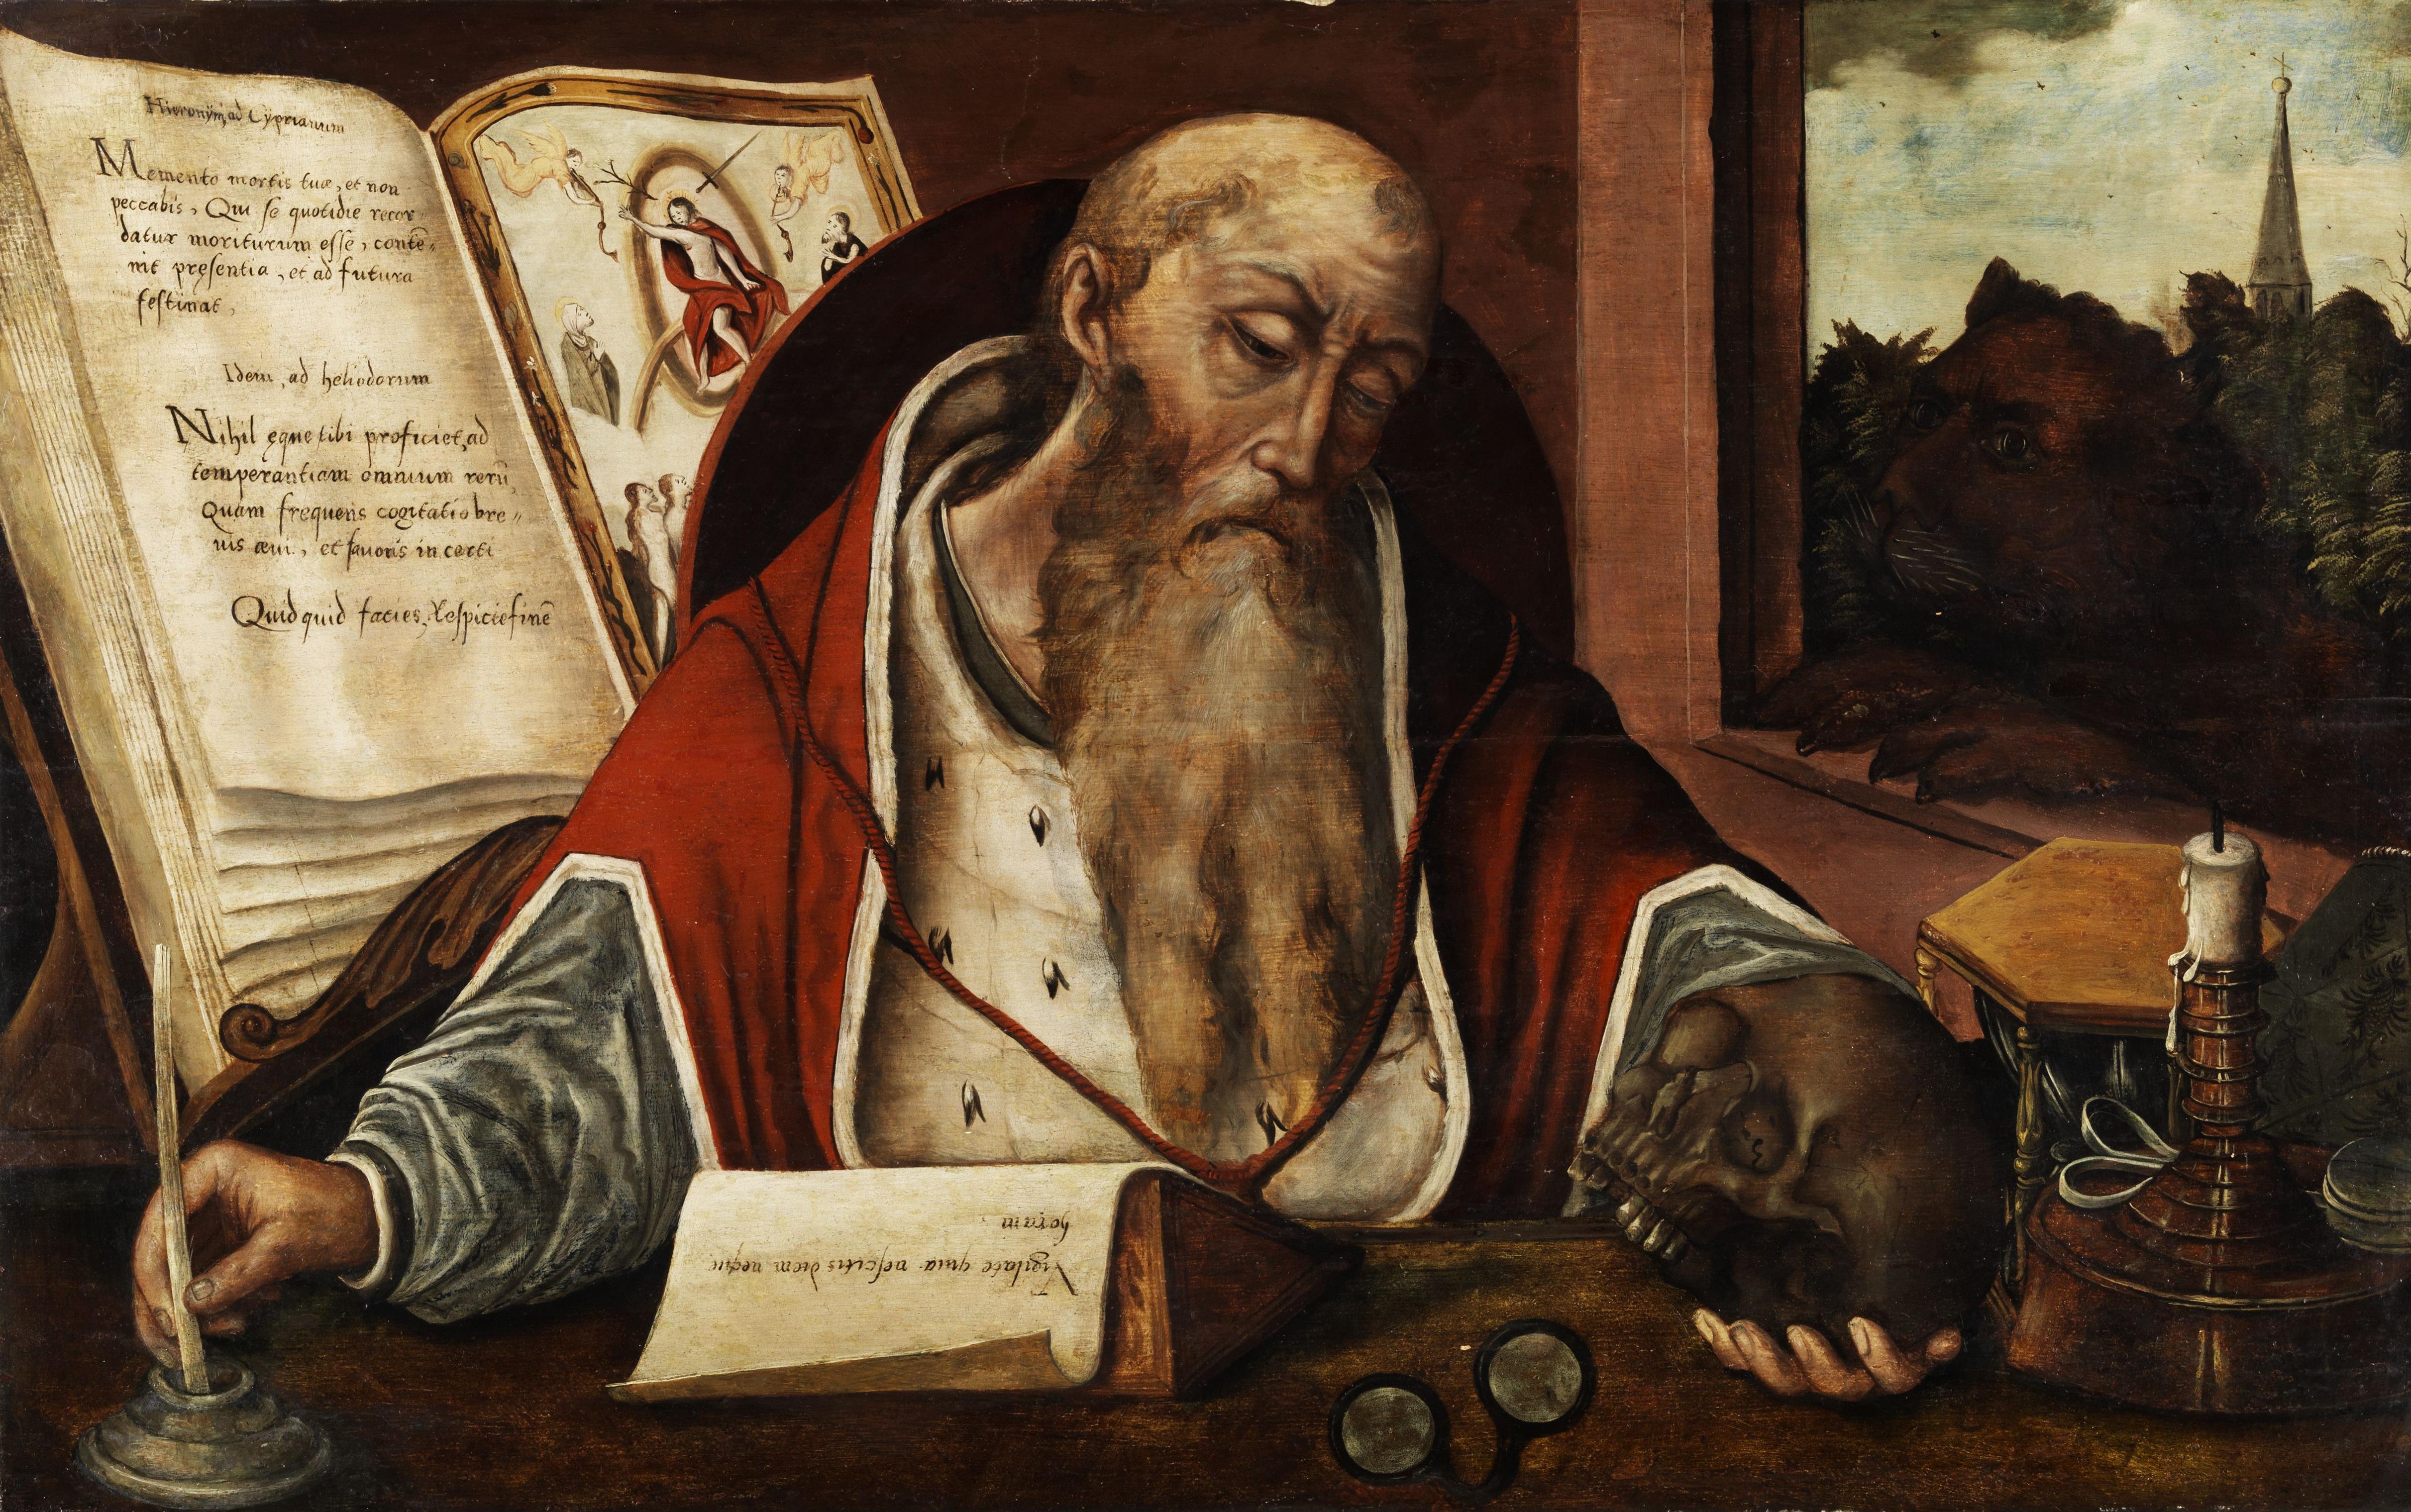 File:Saint Hieronymus (follower of Joos van Cleve).jpg - Wikimedia Commons